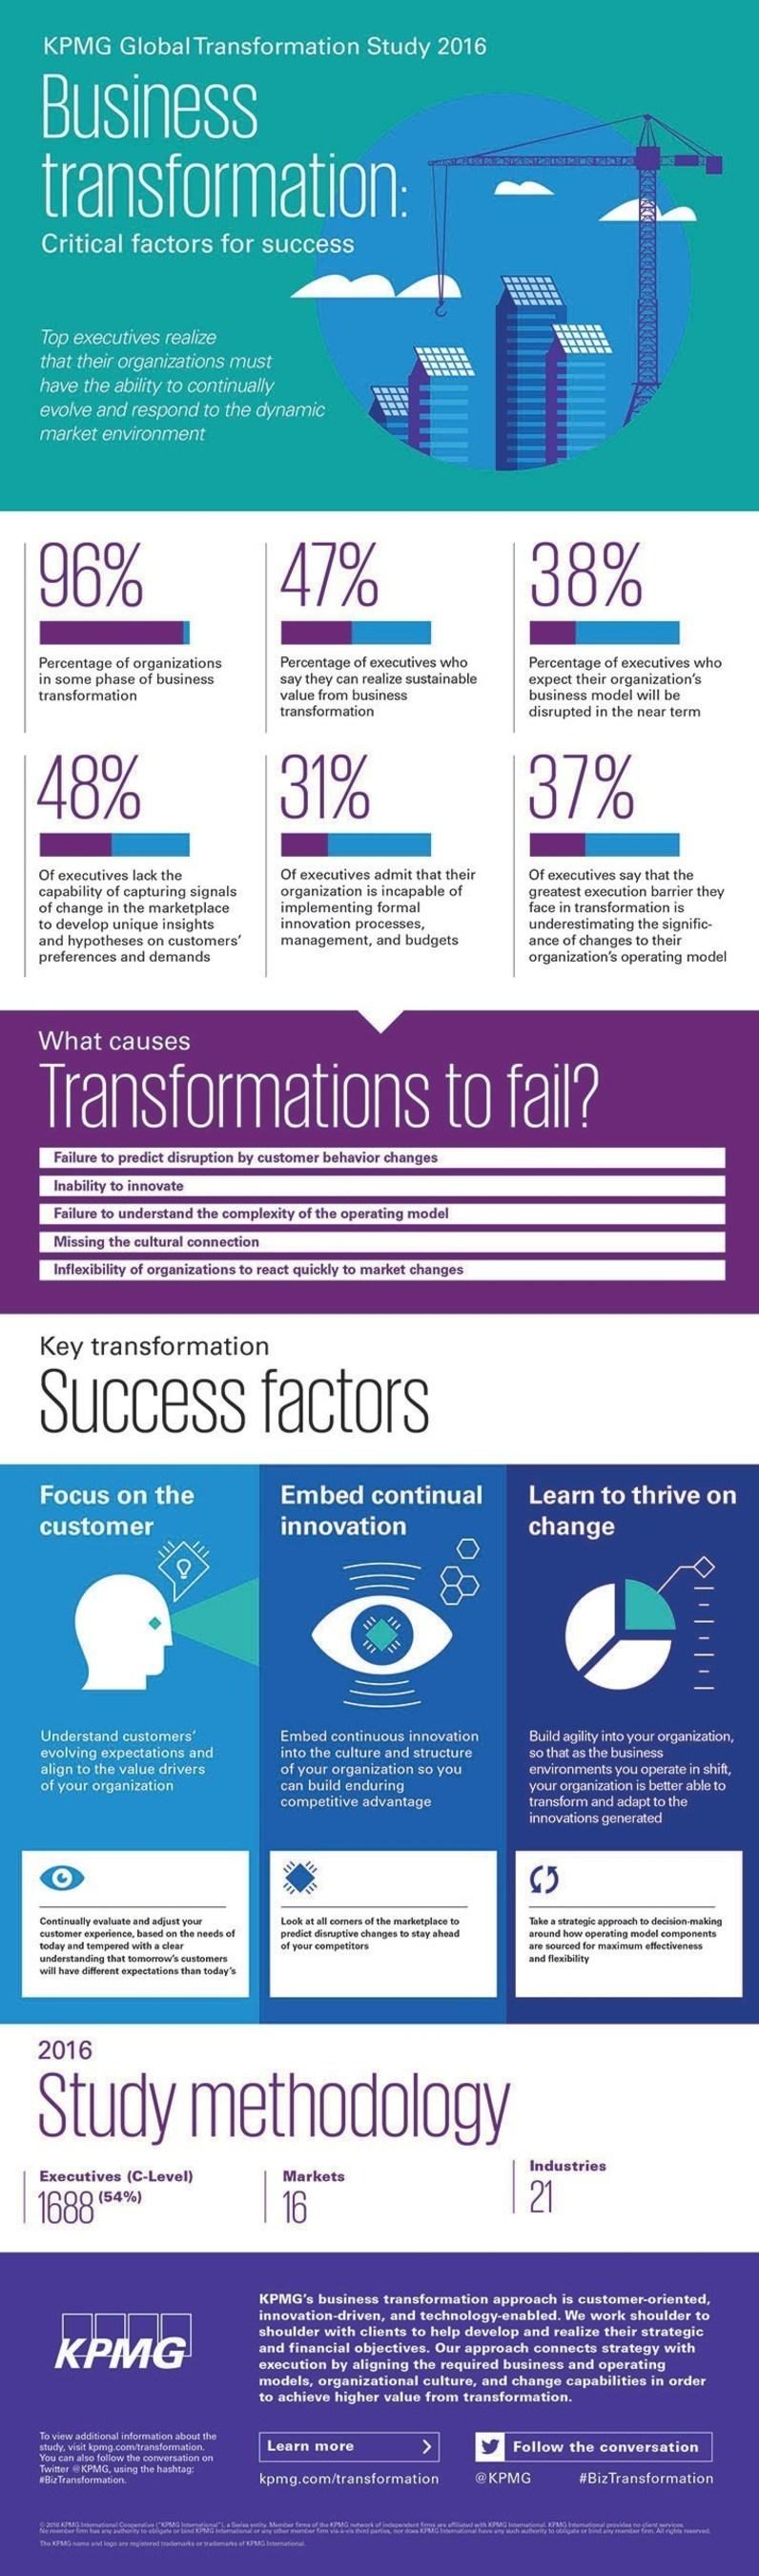 KPMG Global Transformation Study 2016